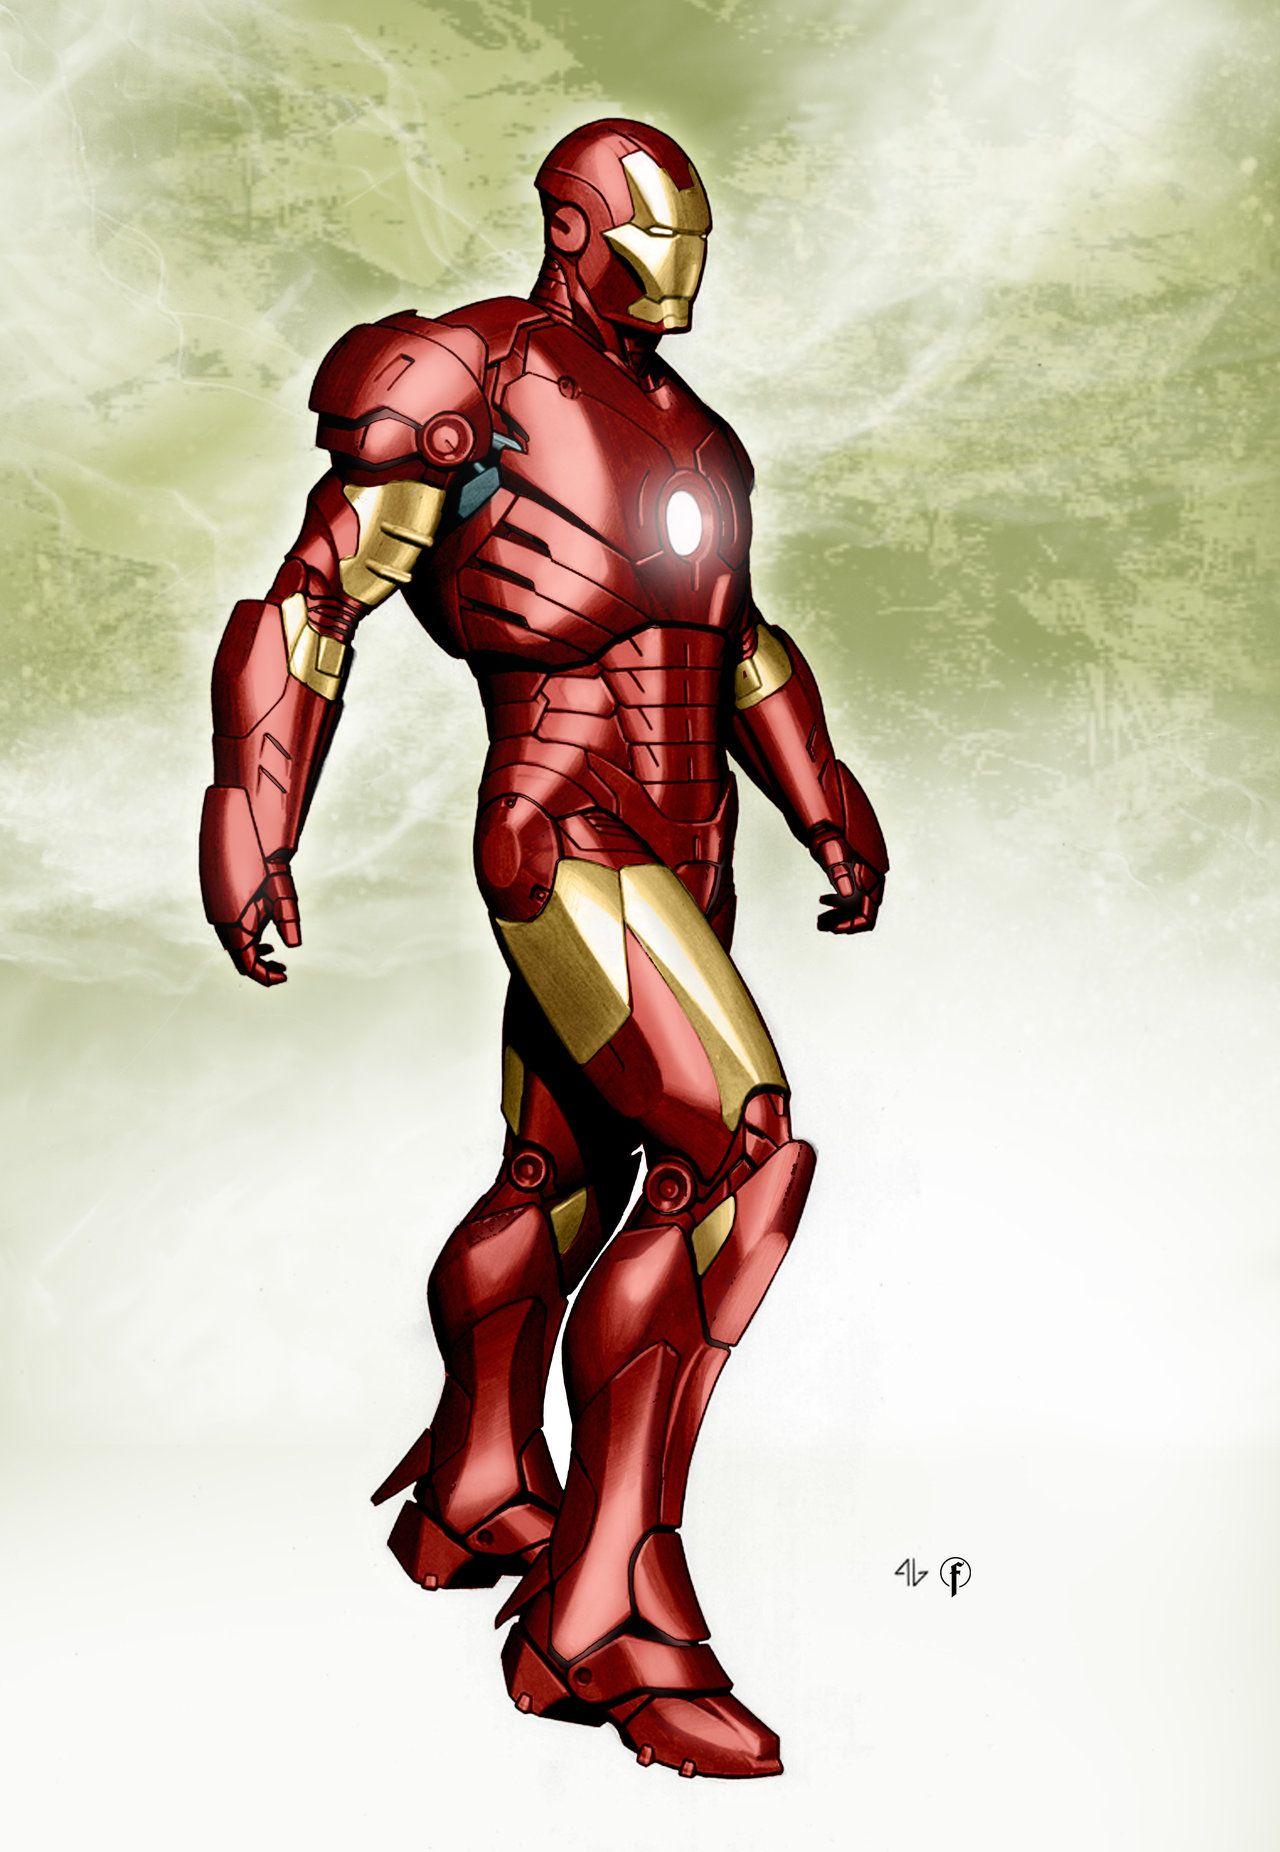 Coloring Adi Granov 3 By Riccardo Fasoli On Deviantart Iron Man Marvel Iron Man Iron Man Tony Stark